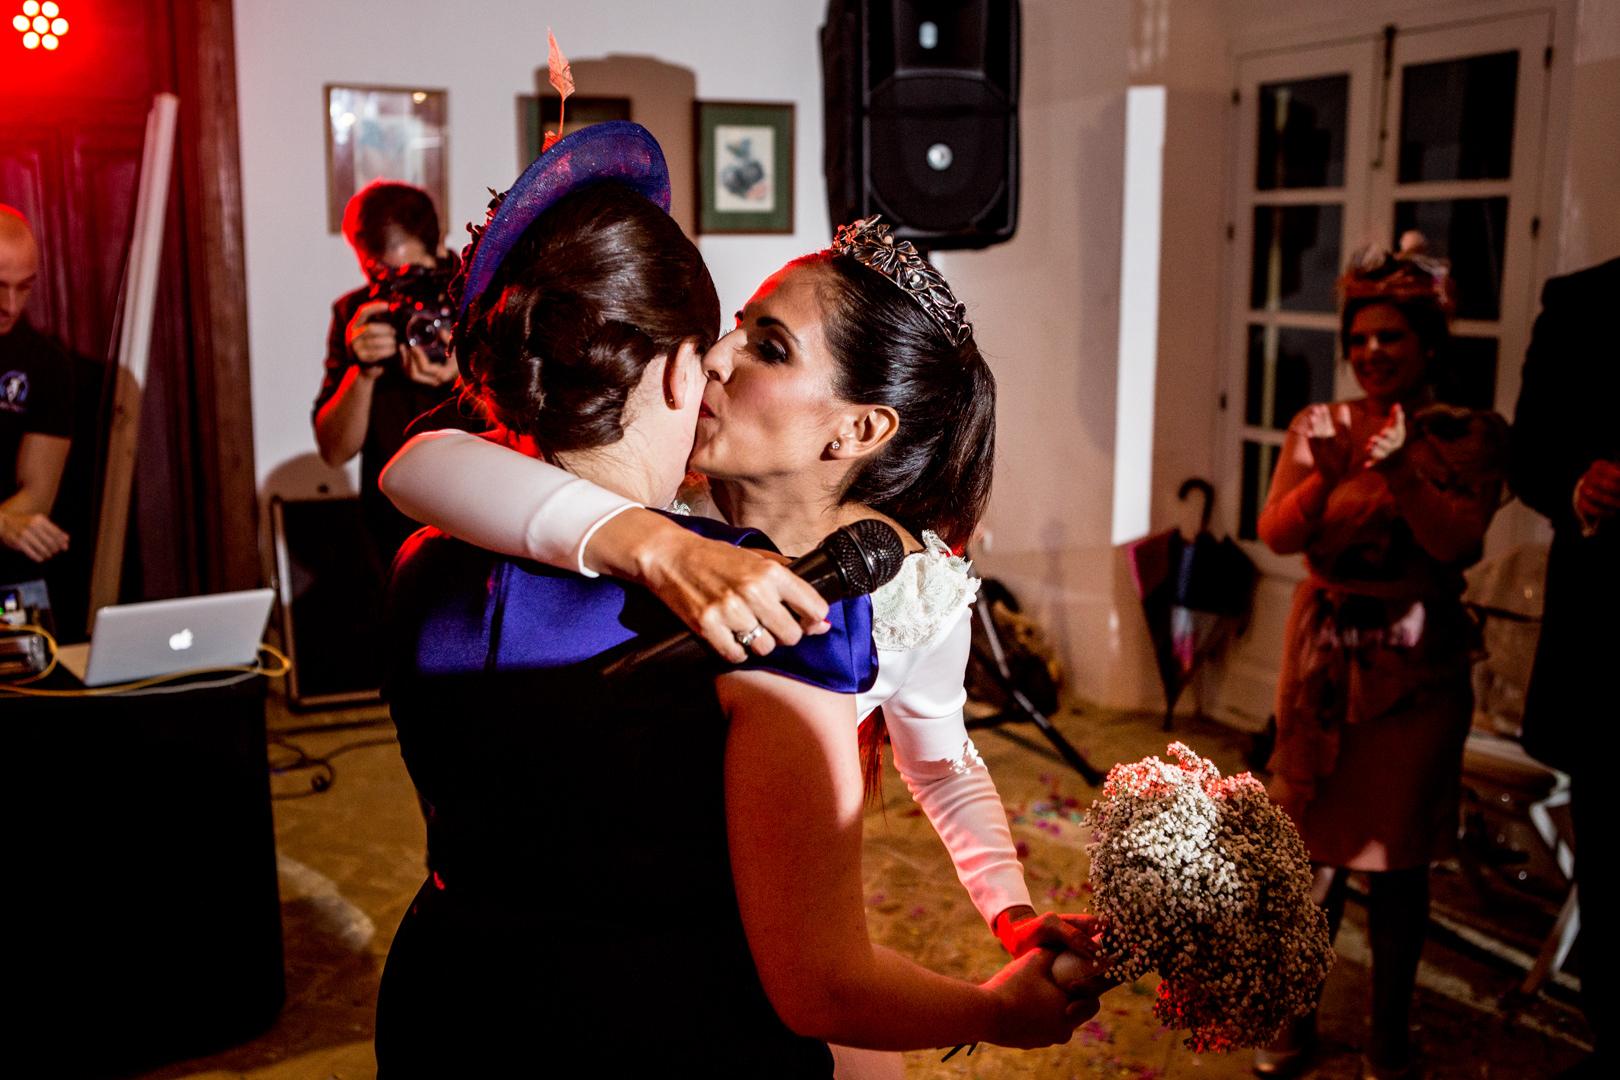 Boda-sevilla-Wedding-engagement-Rafael-Torres-fotografo-bodas-sevilla-madrid-barcelona-wedding-photographer--77.jpg